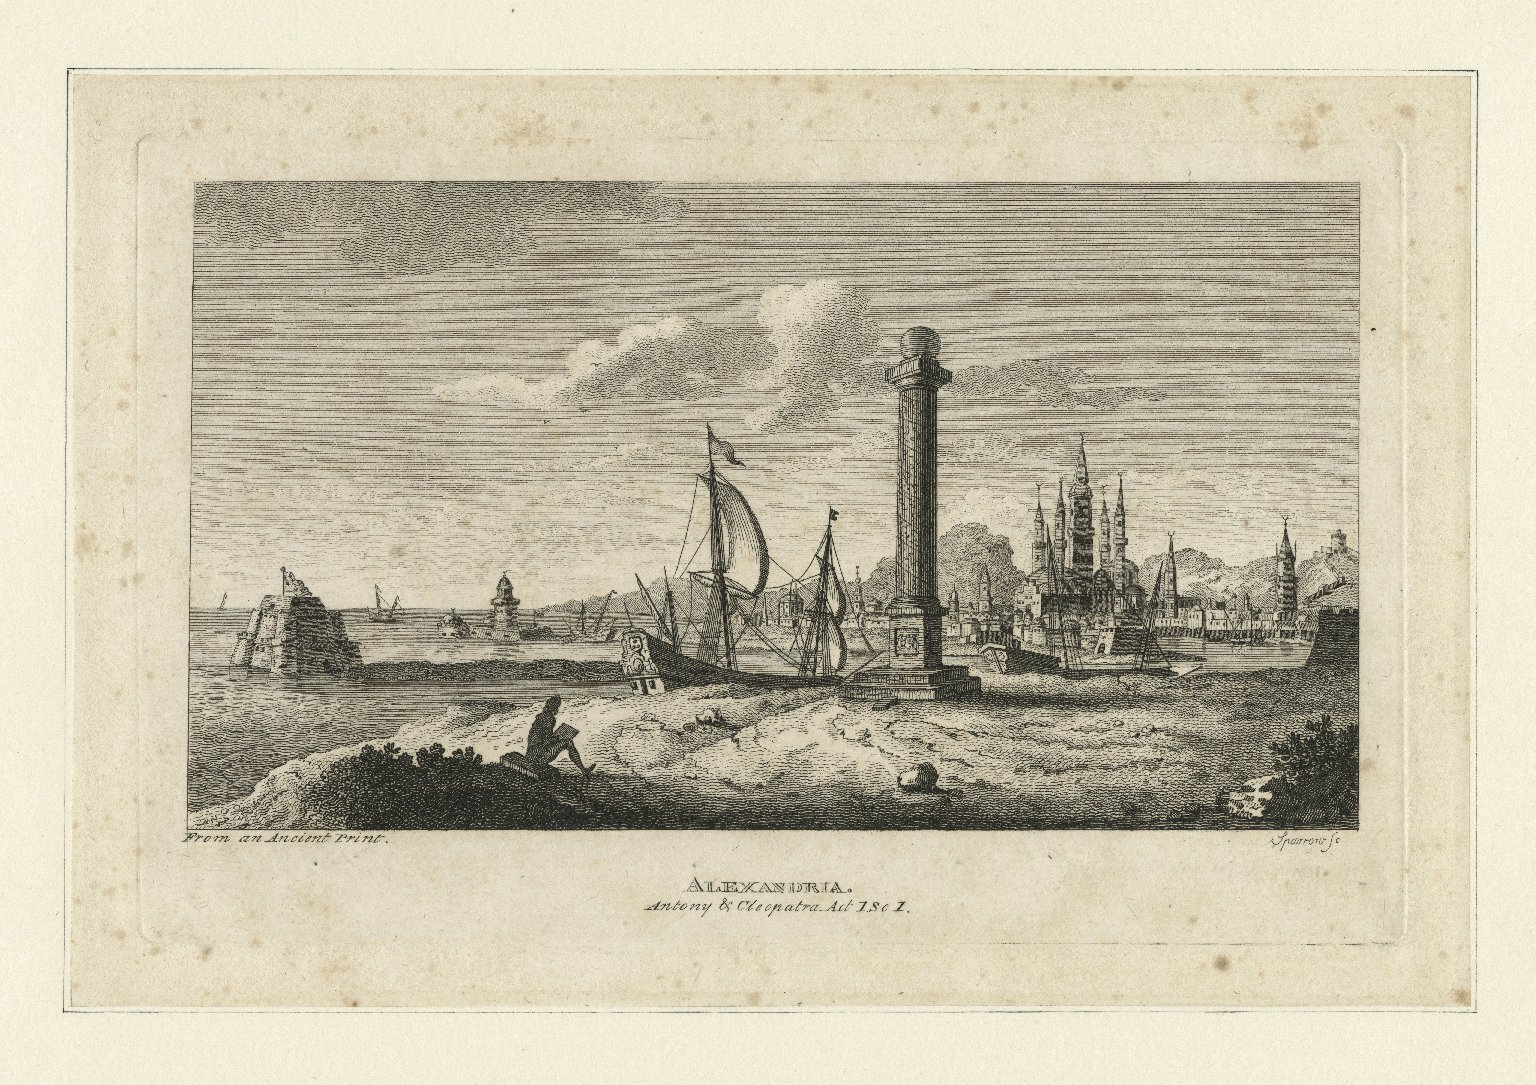 Alexandria [Egypt], Antony & Cleopatra, act 1, sc. 1 [graphic] / Sparrow, sc.